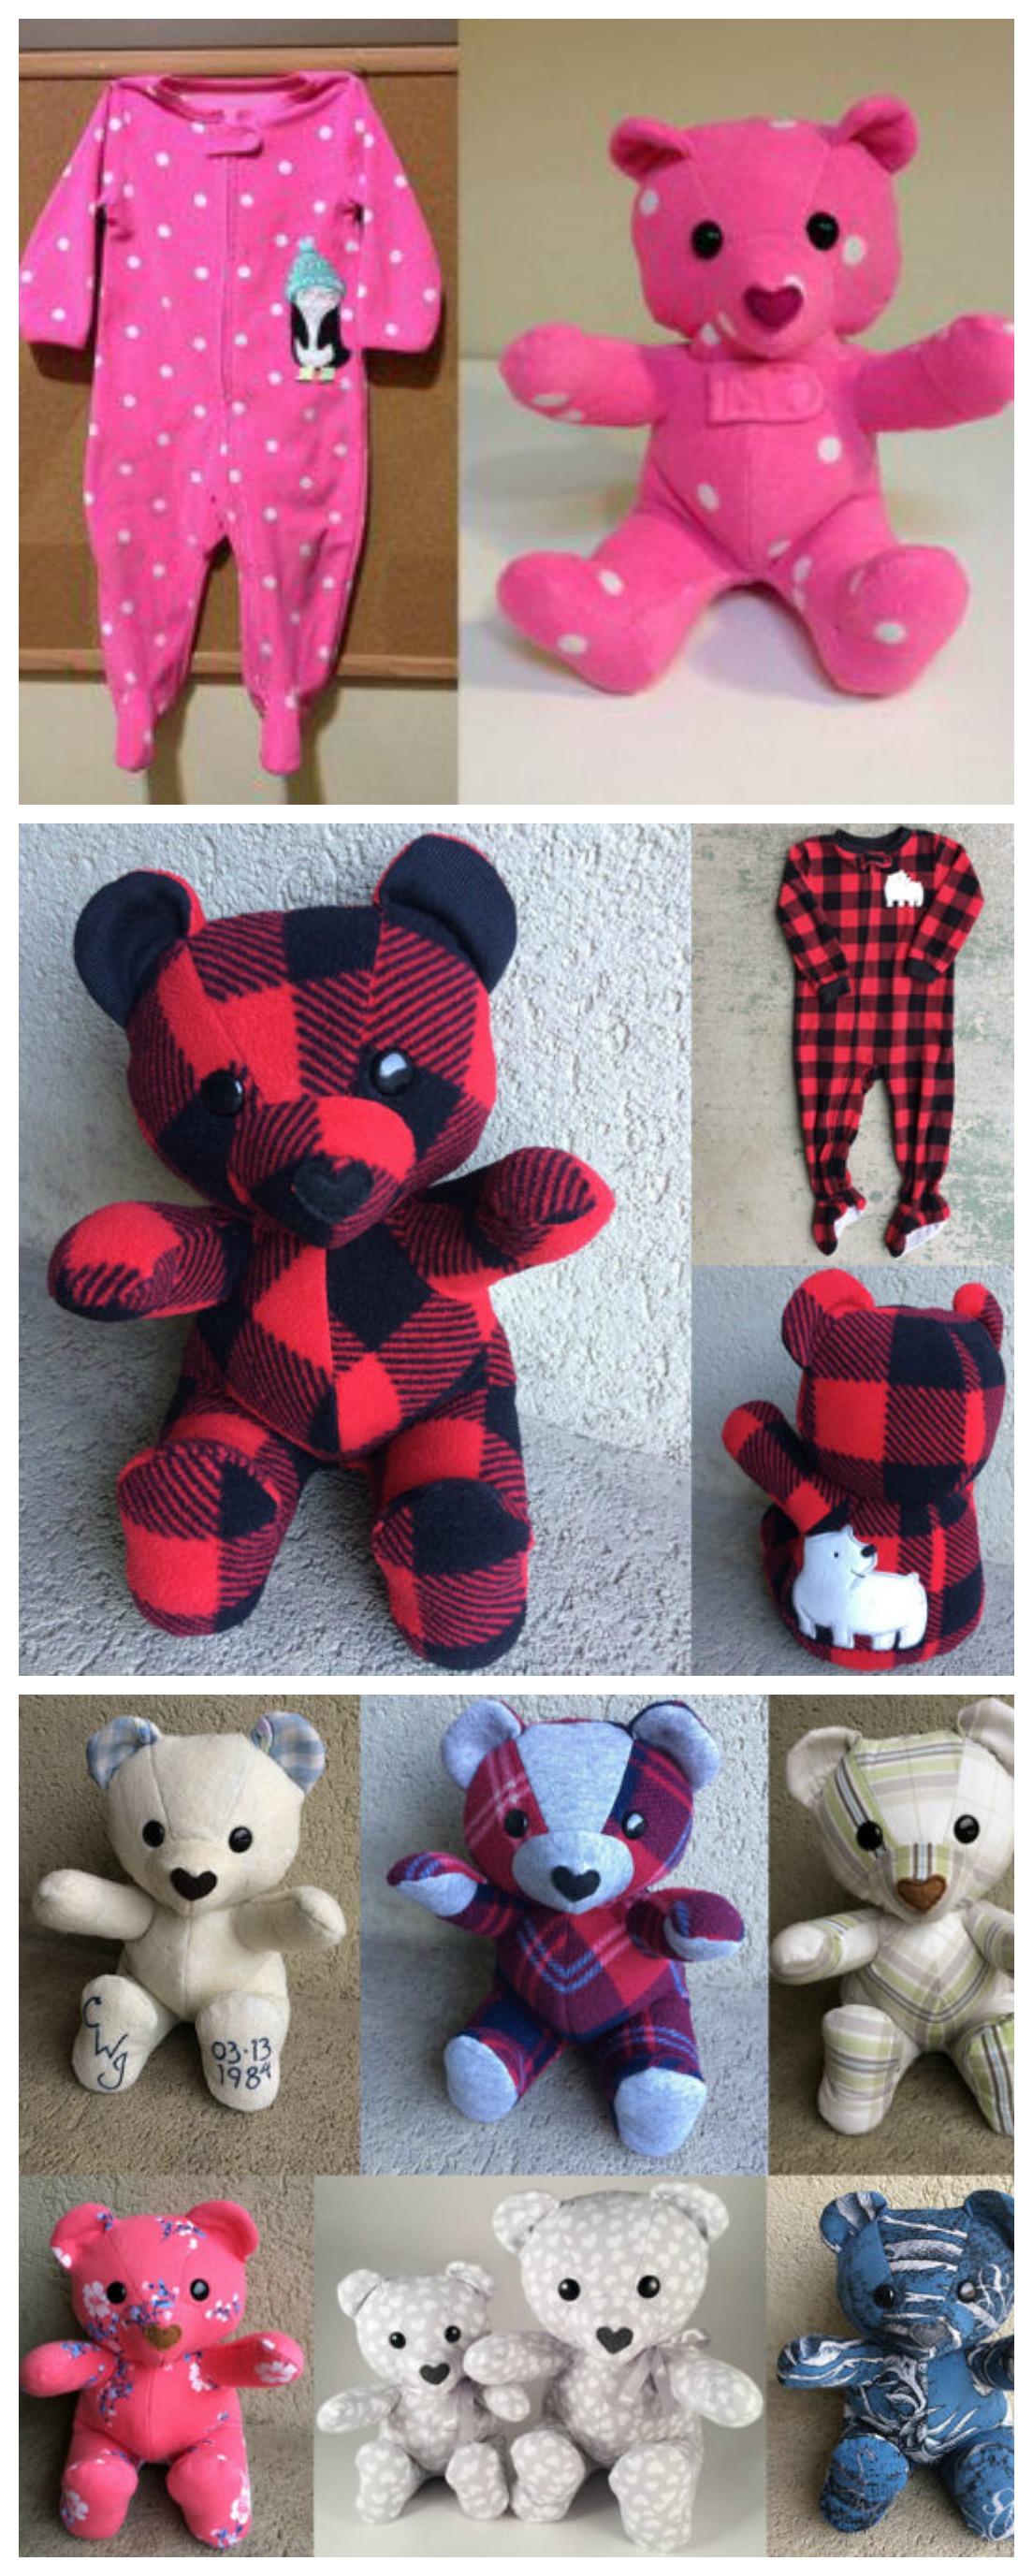 Diy Keepsake Memory Teddy Bear From Baby Clothes